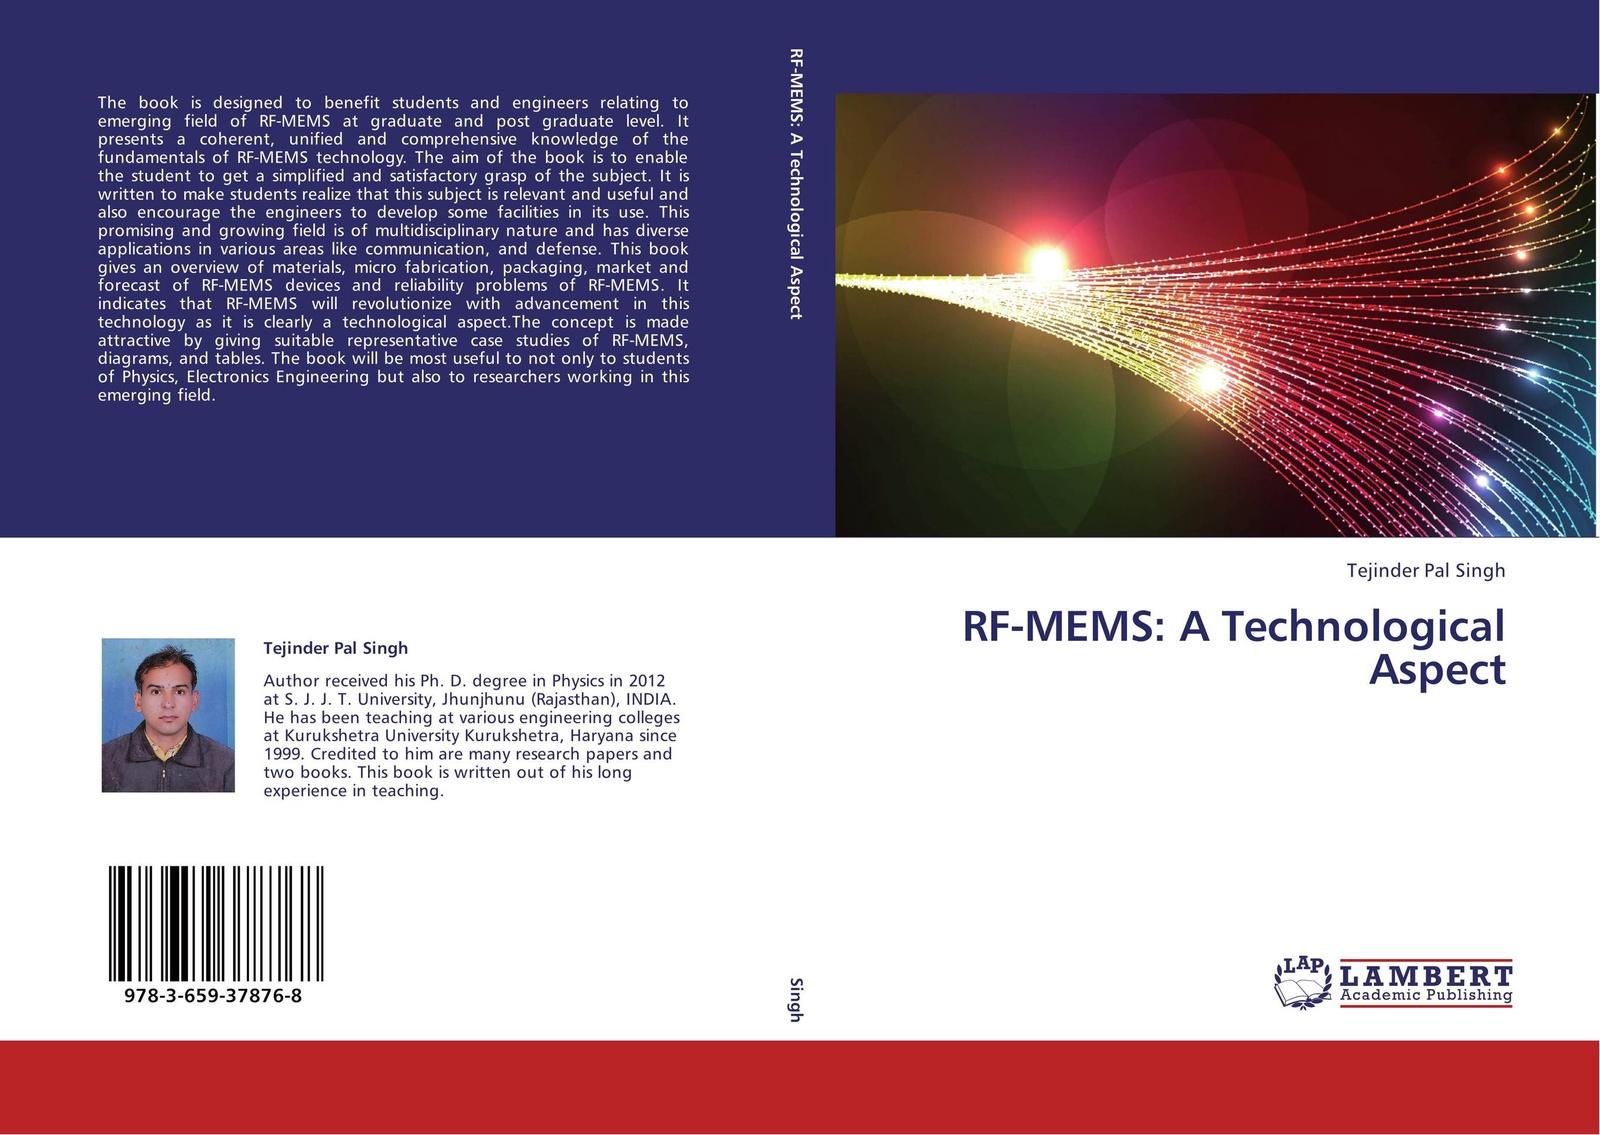 Tejinder Pal Singh RF-MEMS: A Technological Aspect